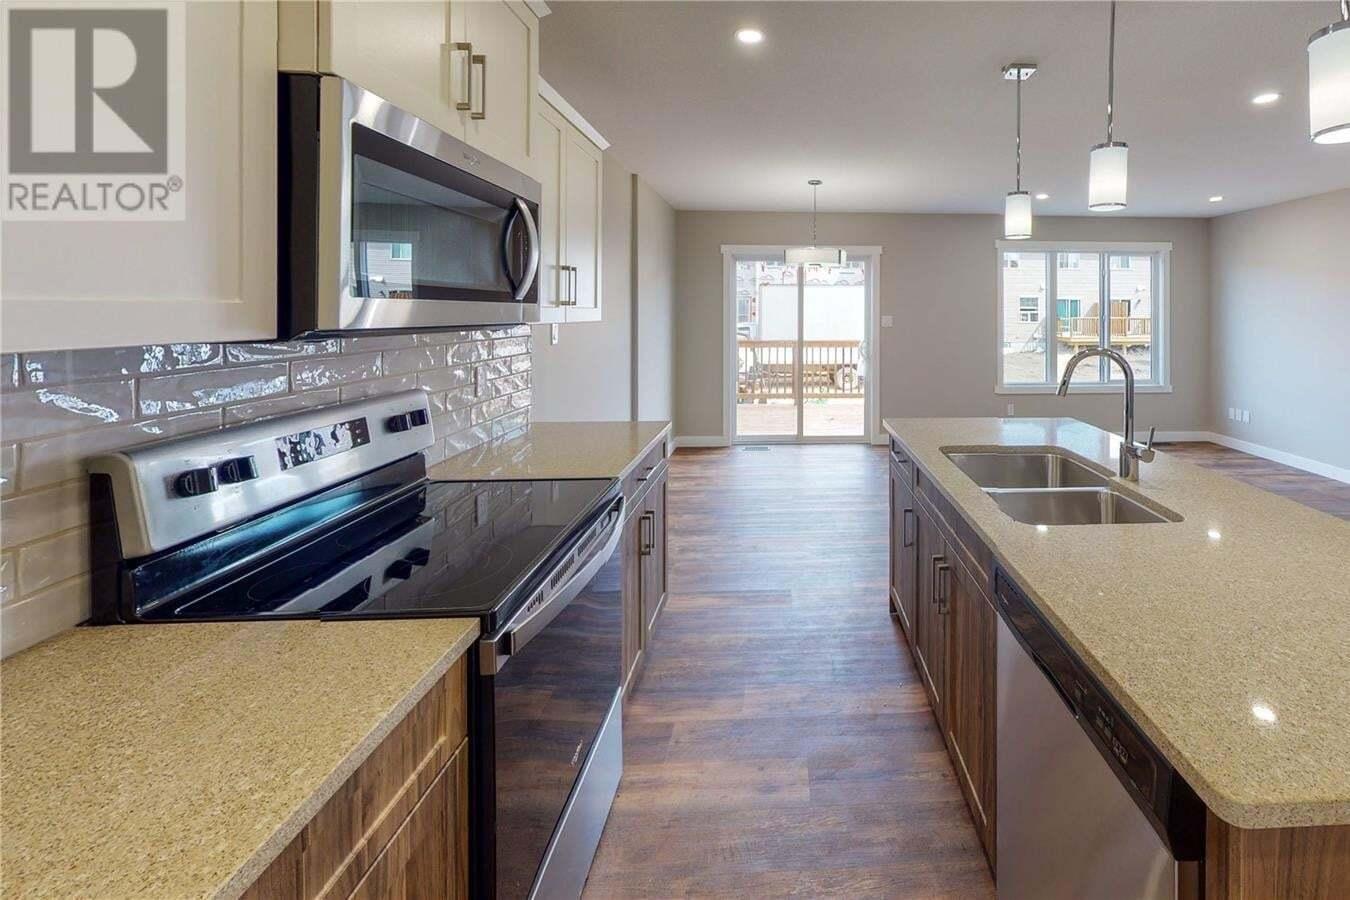 Townhouse for sale at 3158 Green Stone Rd Regina Saskatchewan - MLS: SK821699